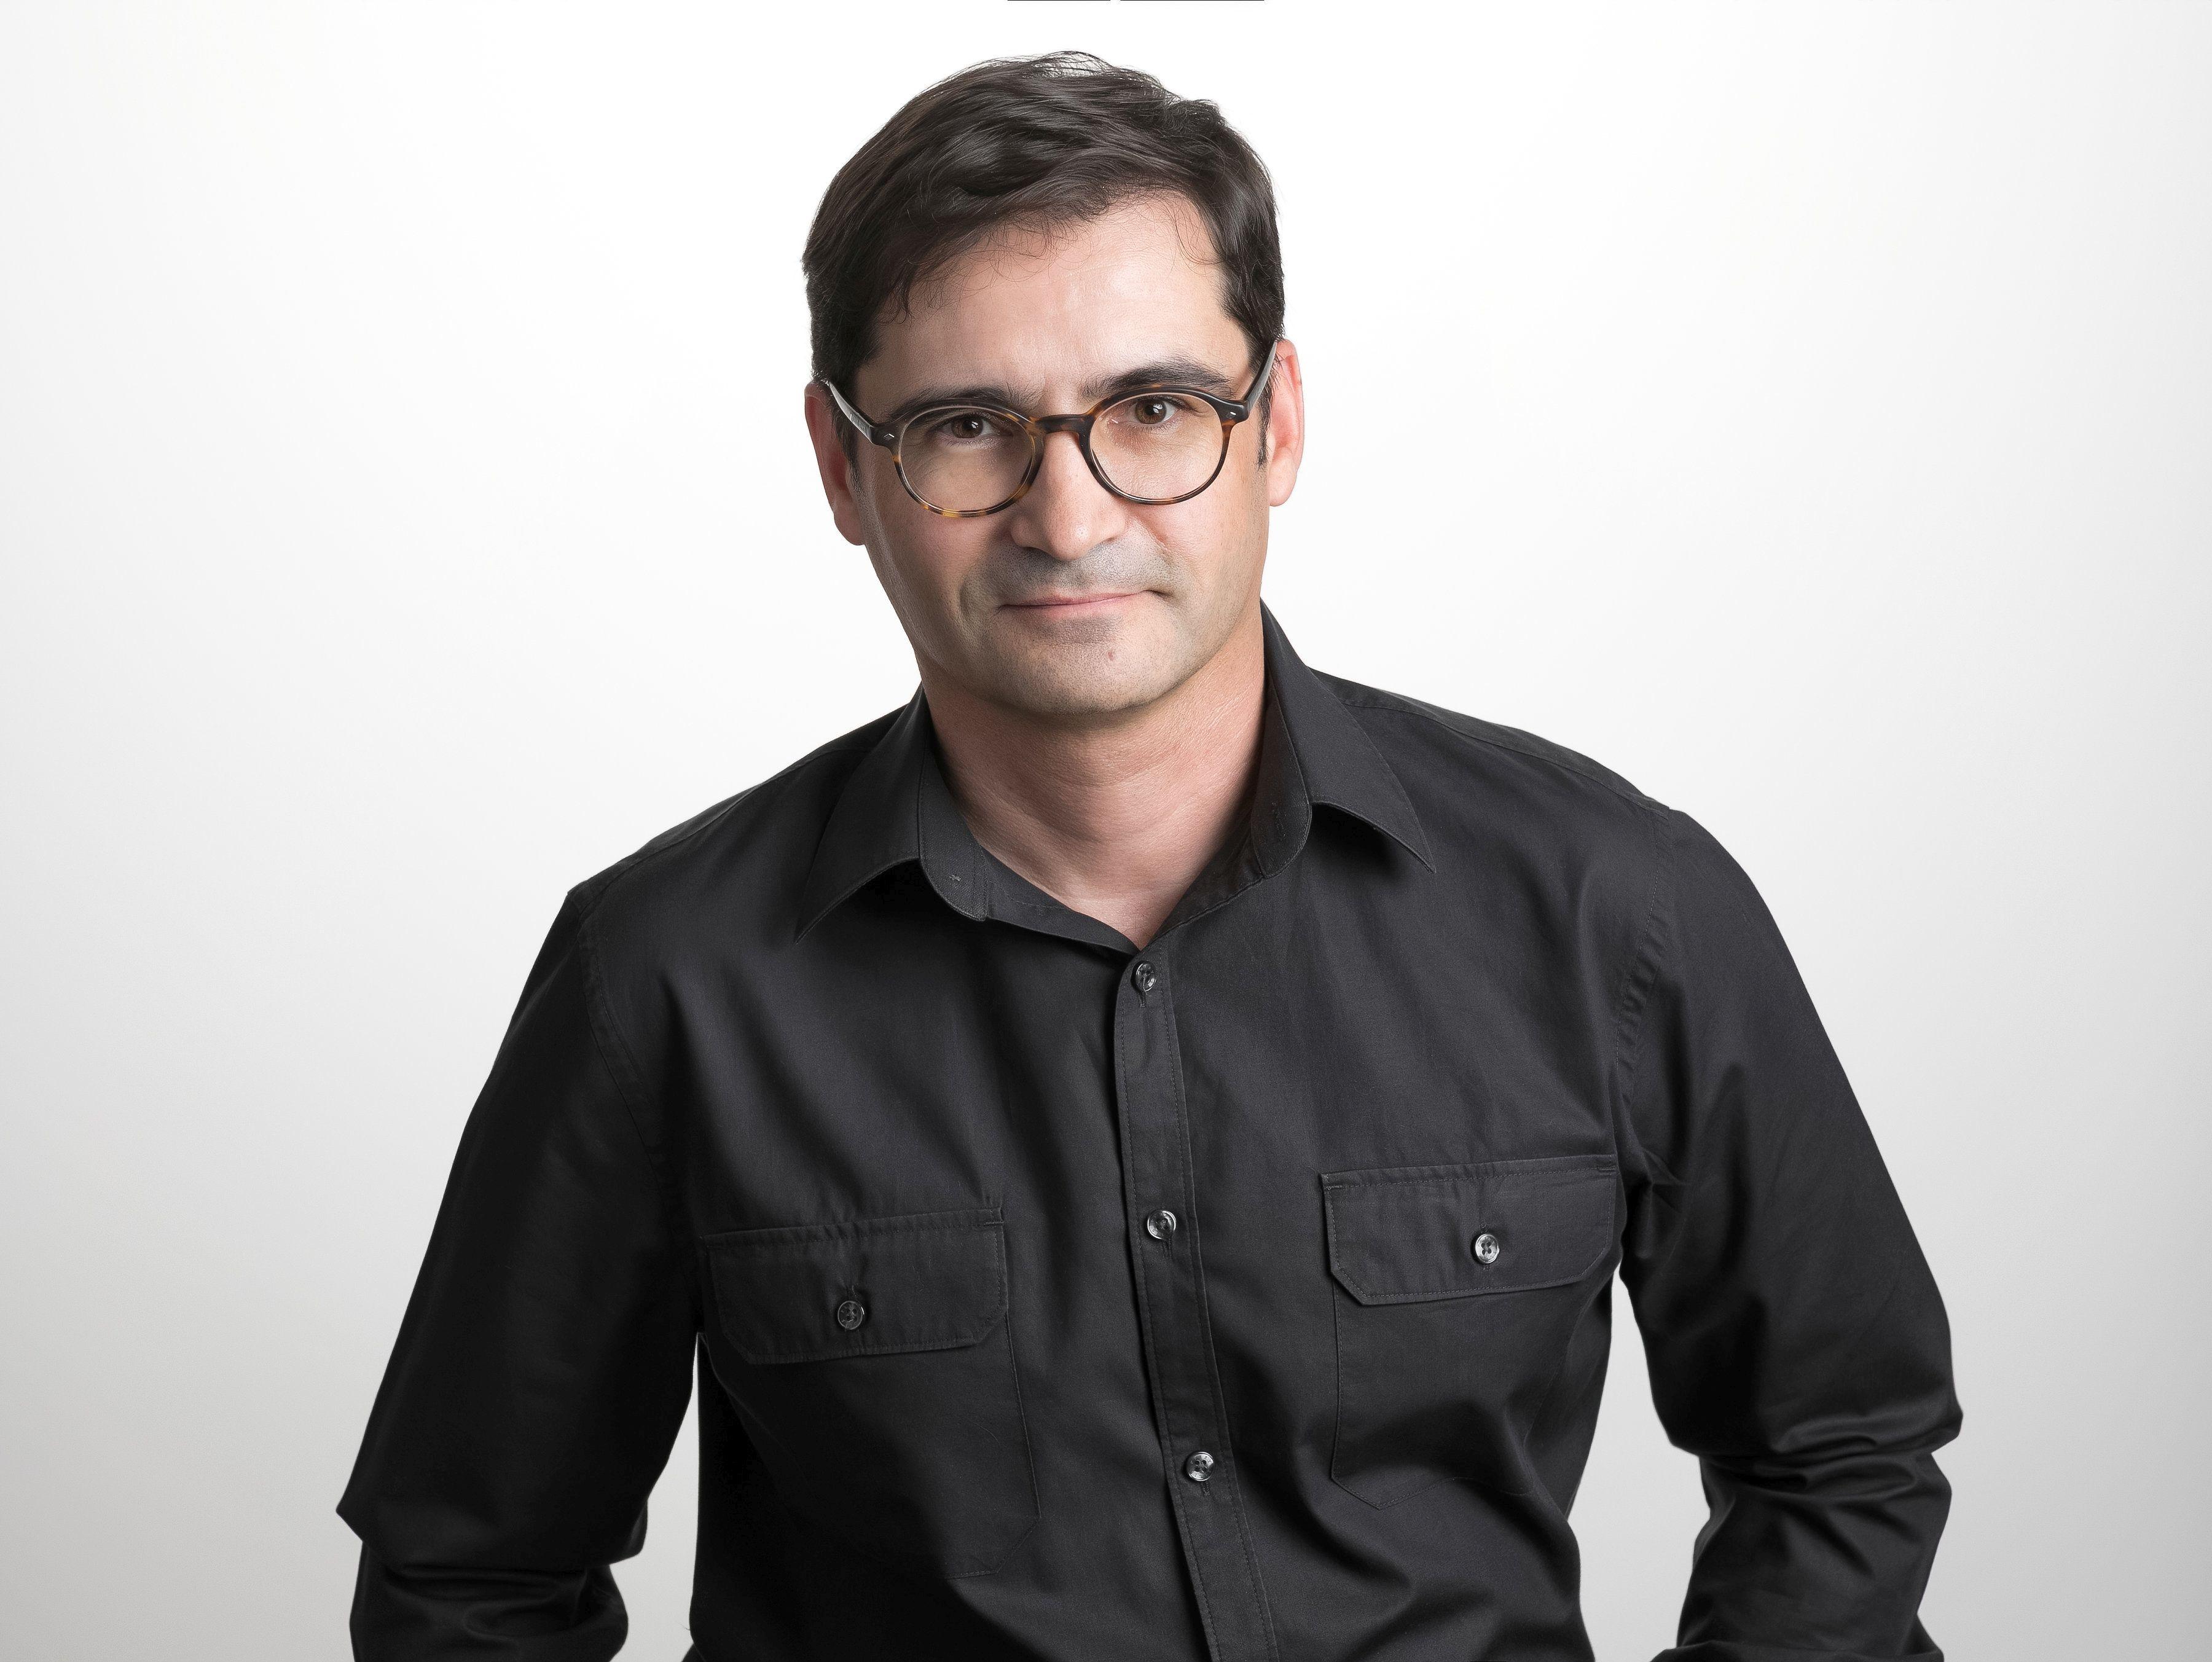 Wook.pt - António Ladeira